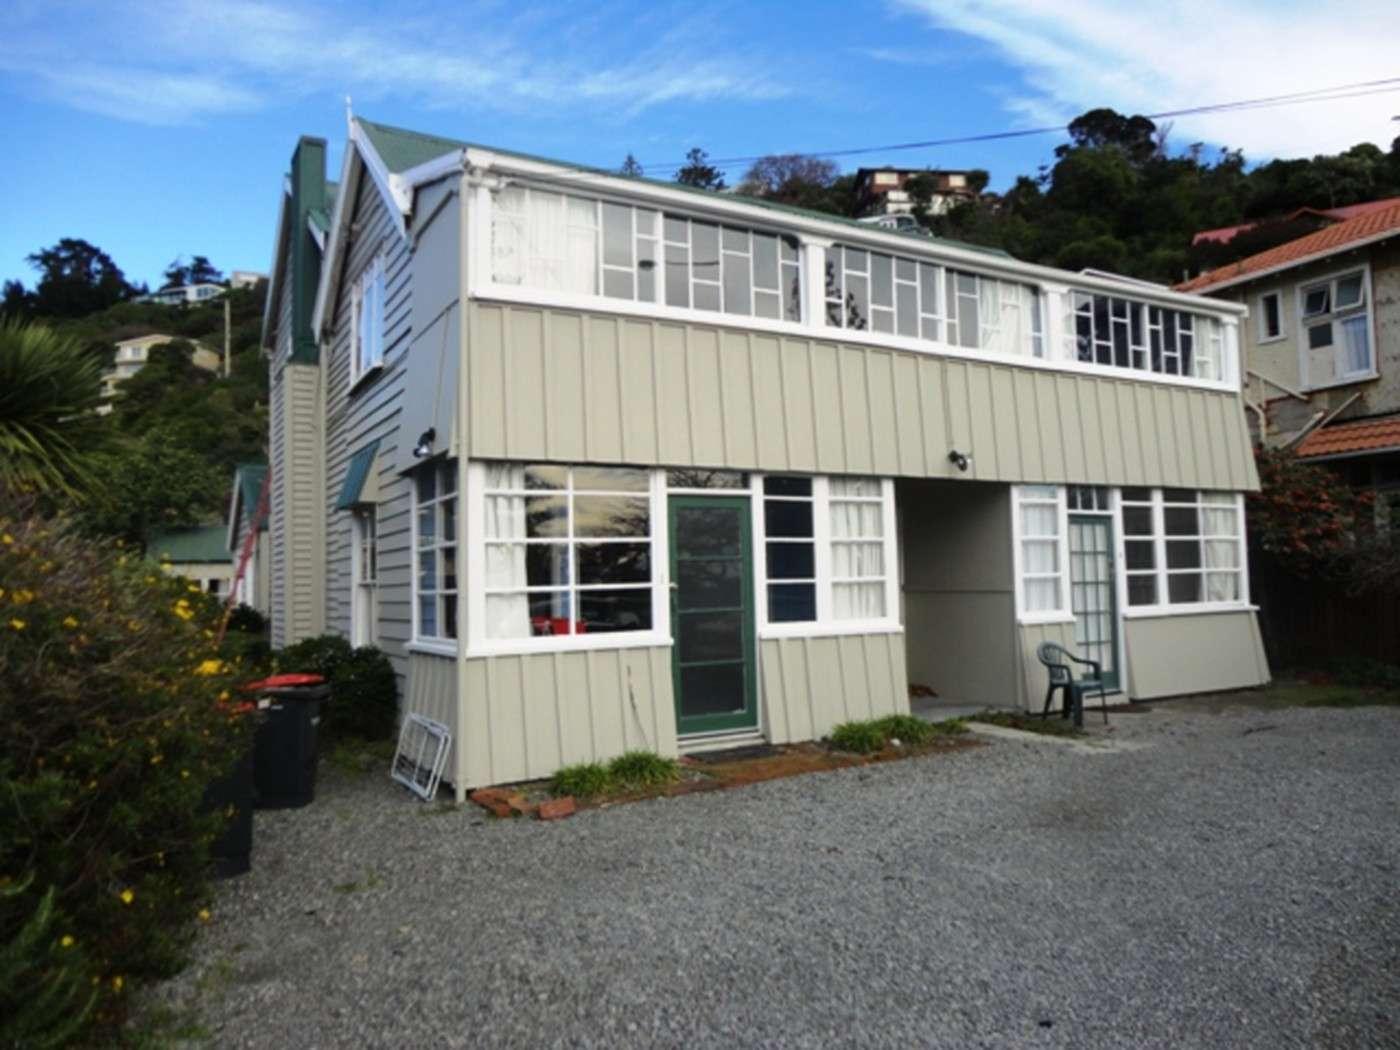 3/4 Marriner Street, SUMNER, Christchurch City 8081